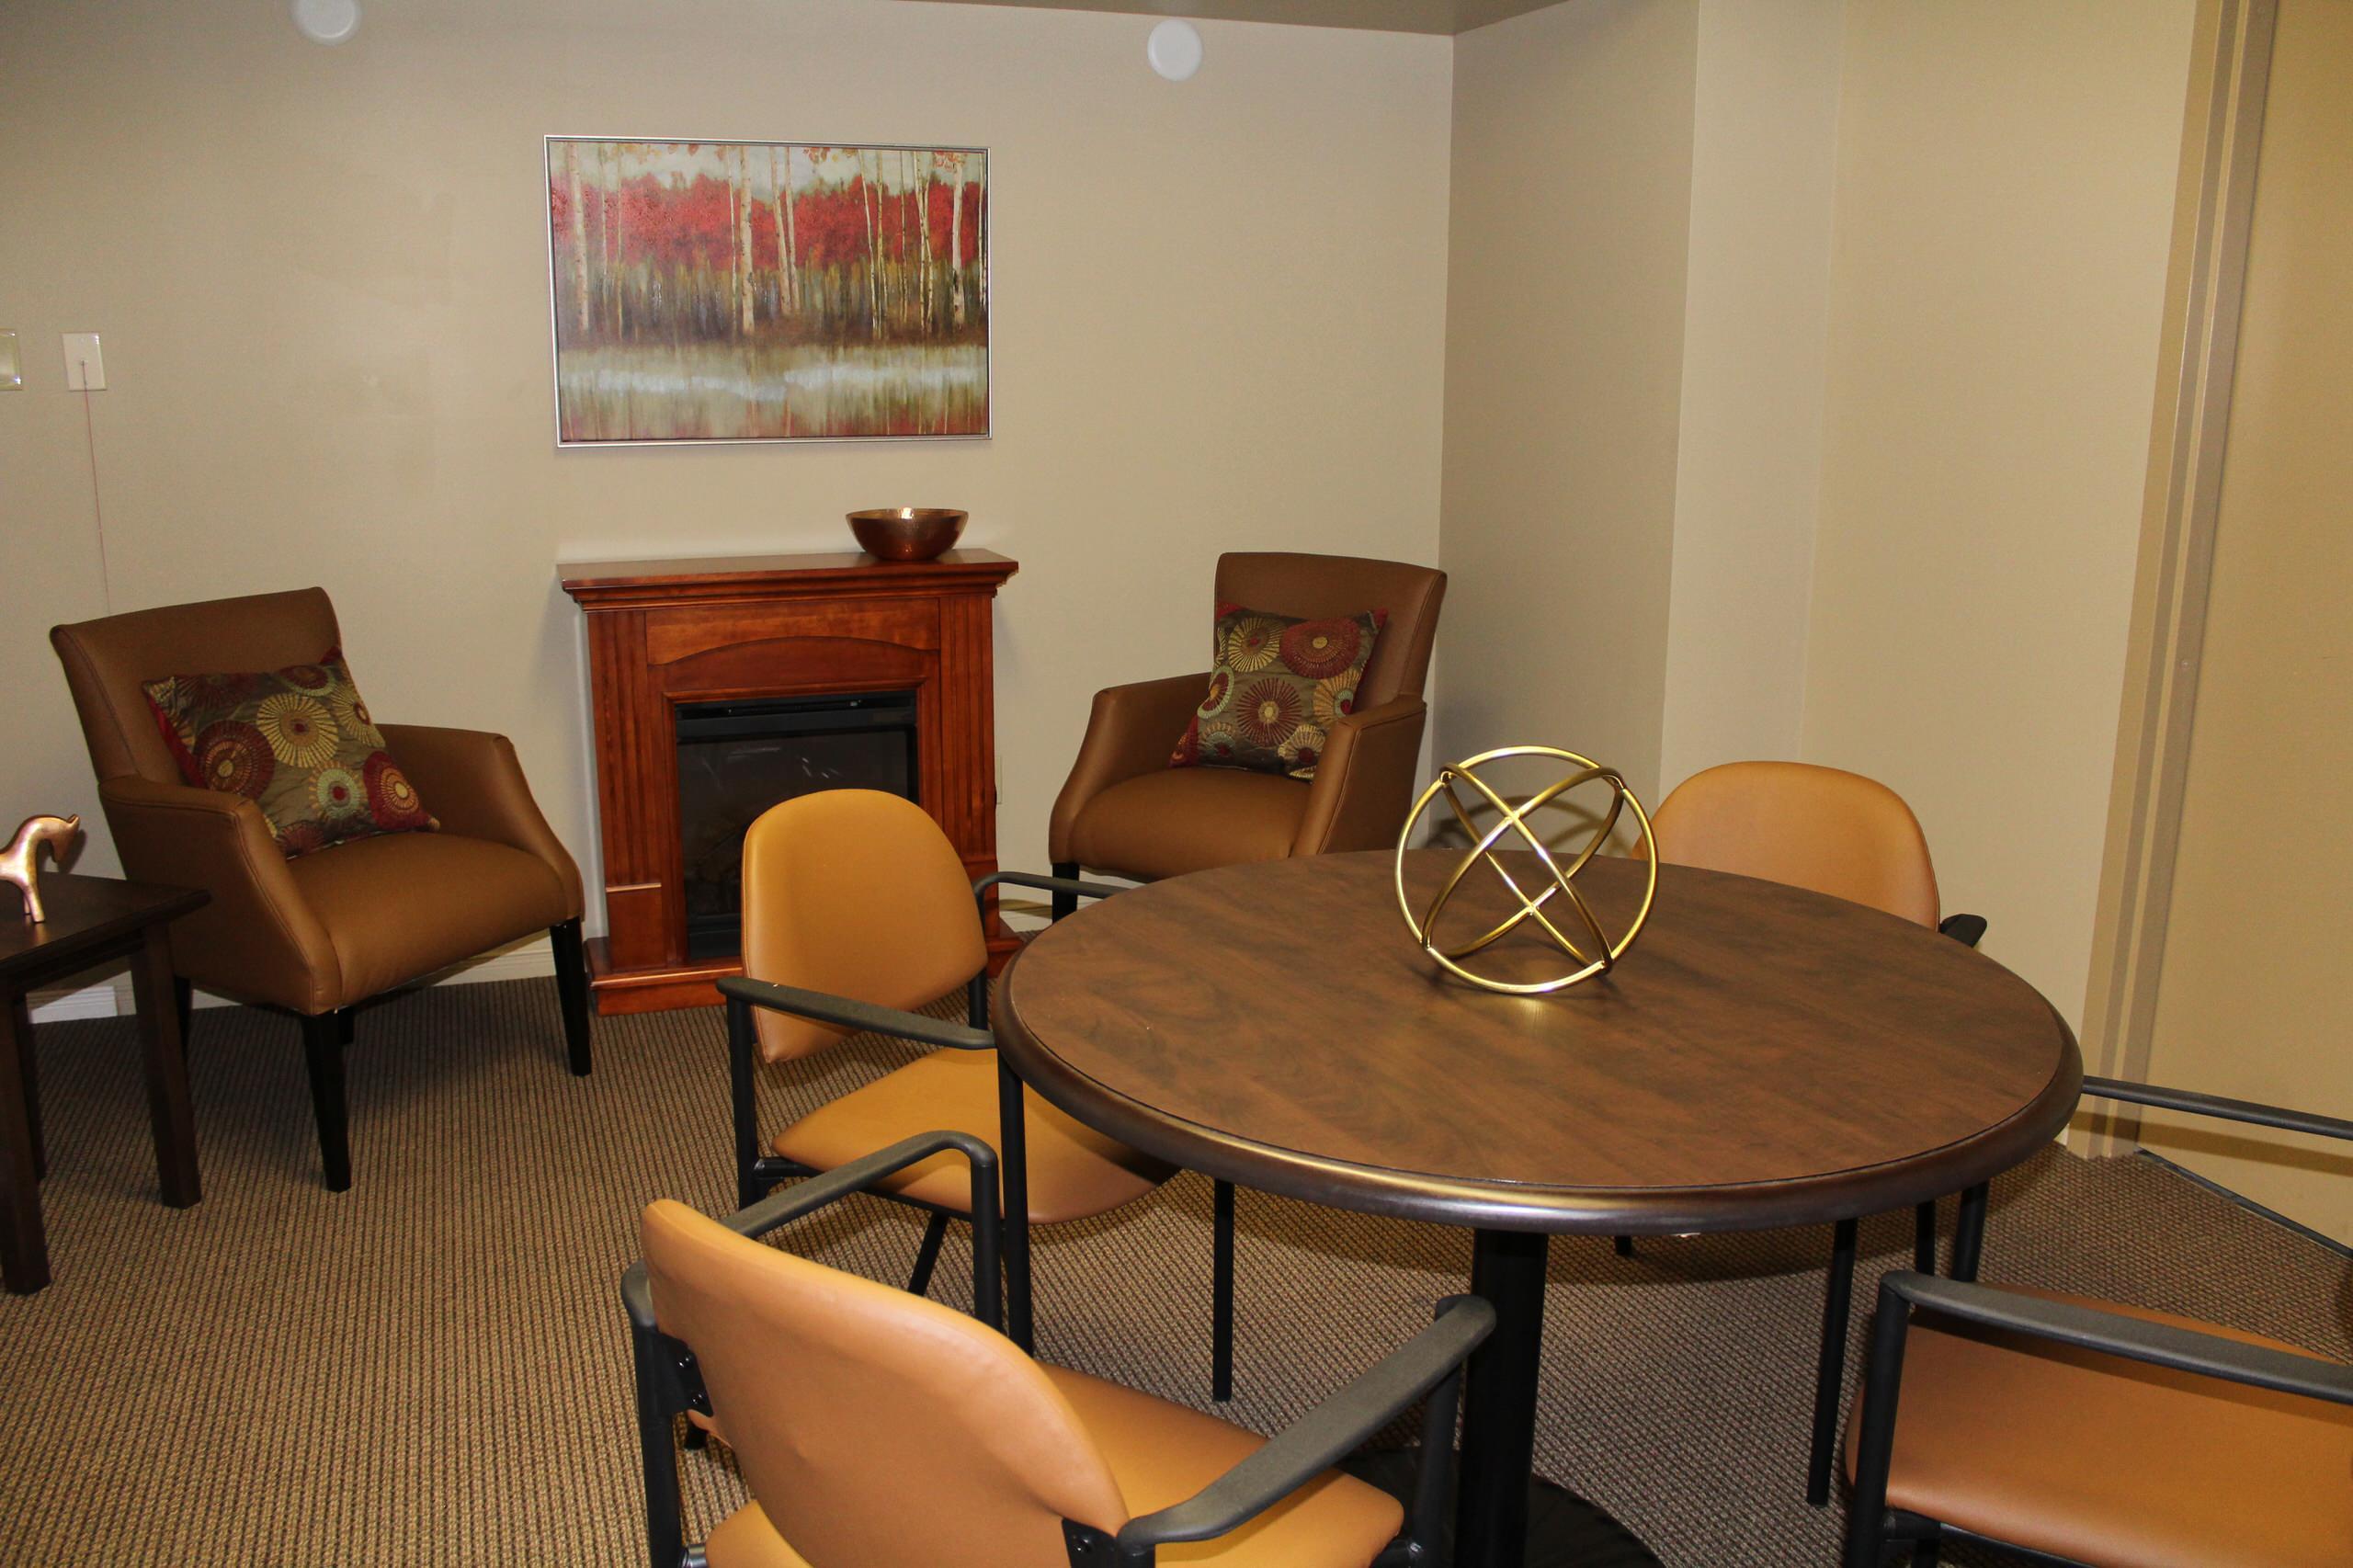 retirement community interiors- simcoe terrace, barrie